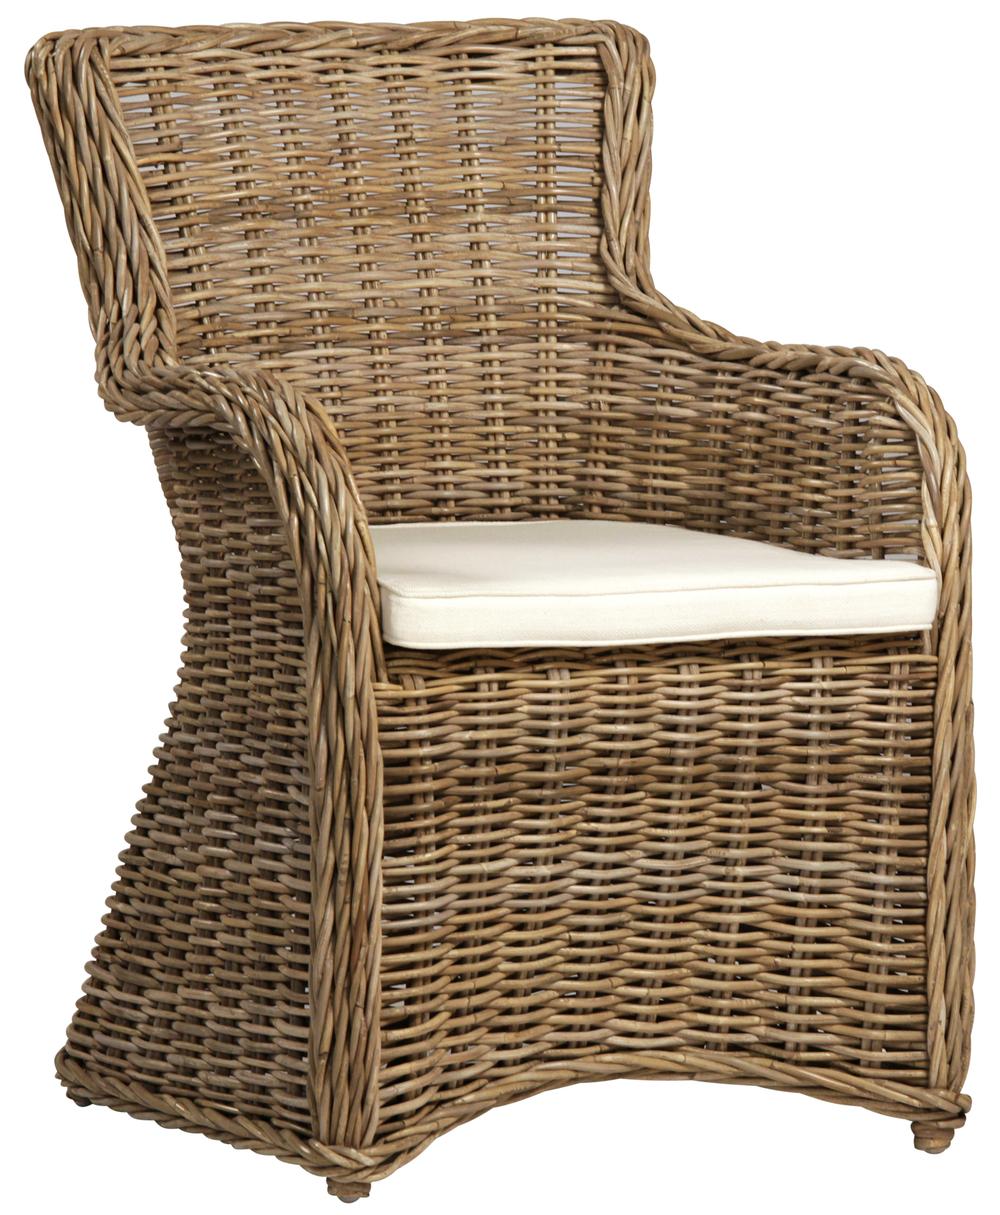 Dovetail Furniture - Kent Arm Chair